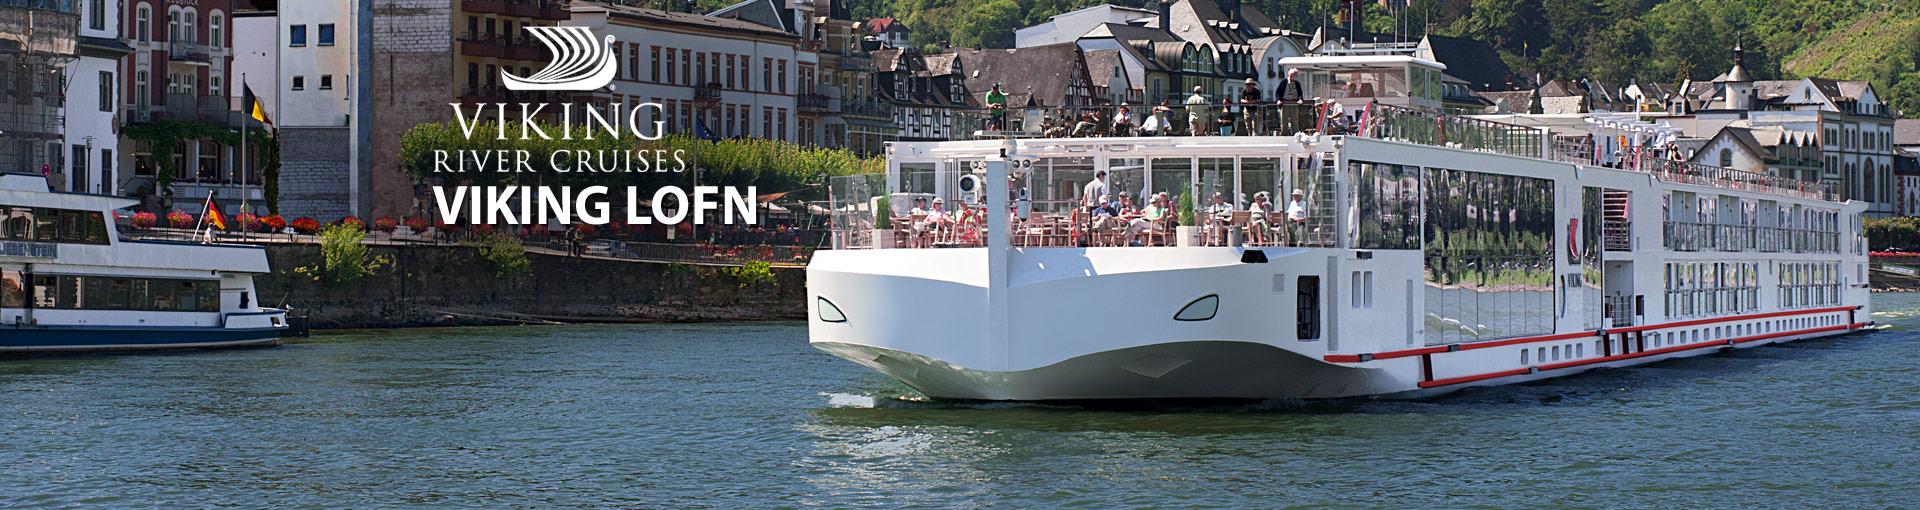 Viking River Viking Lofn river cruise ship